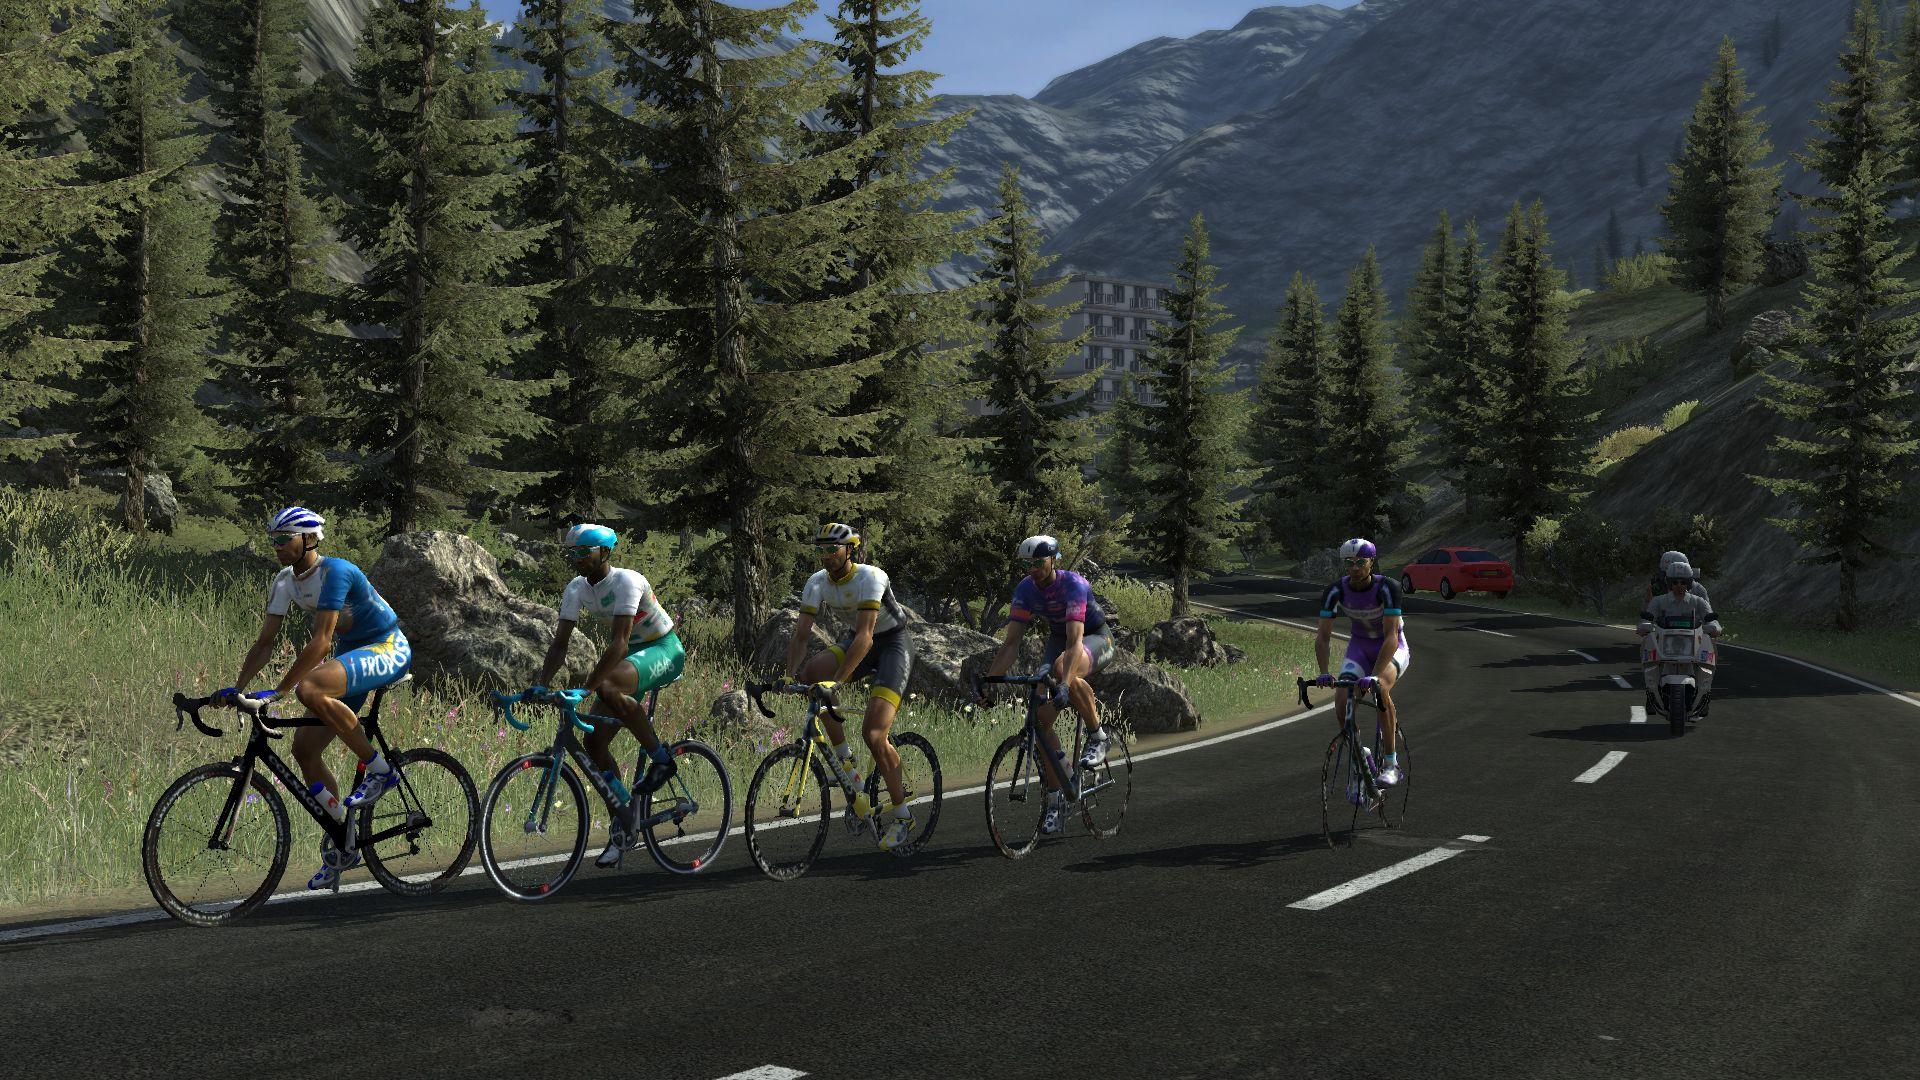 pcmdaily.com/images/mg/2017/Races/CT/Trentino/mg2017_trentino_02_PCM0036.jpg